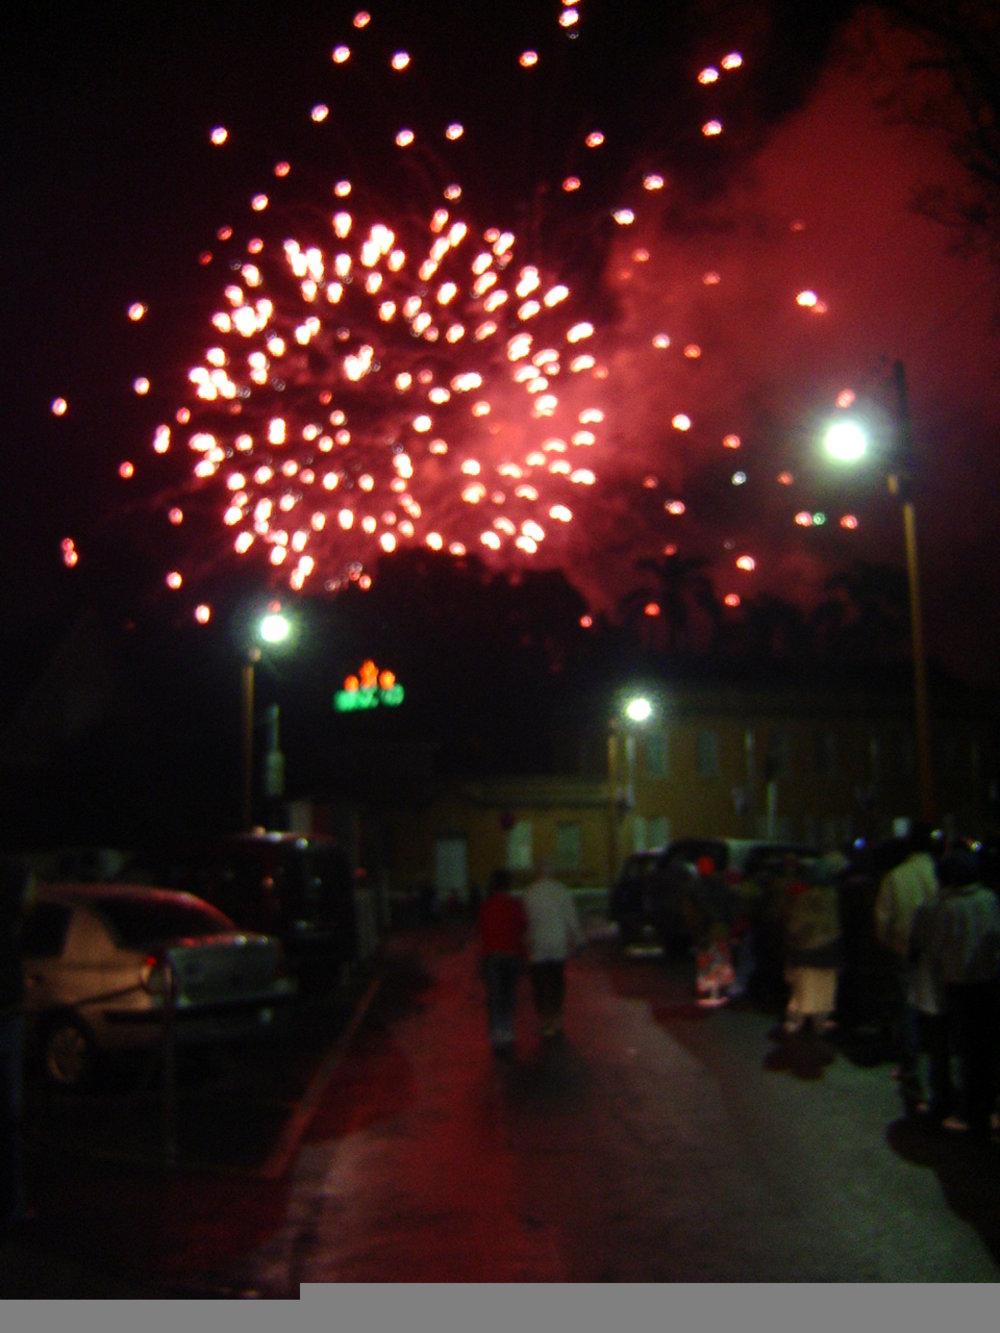 Fireworks display in Mantasua